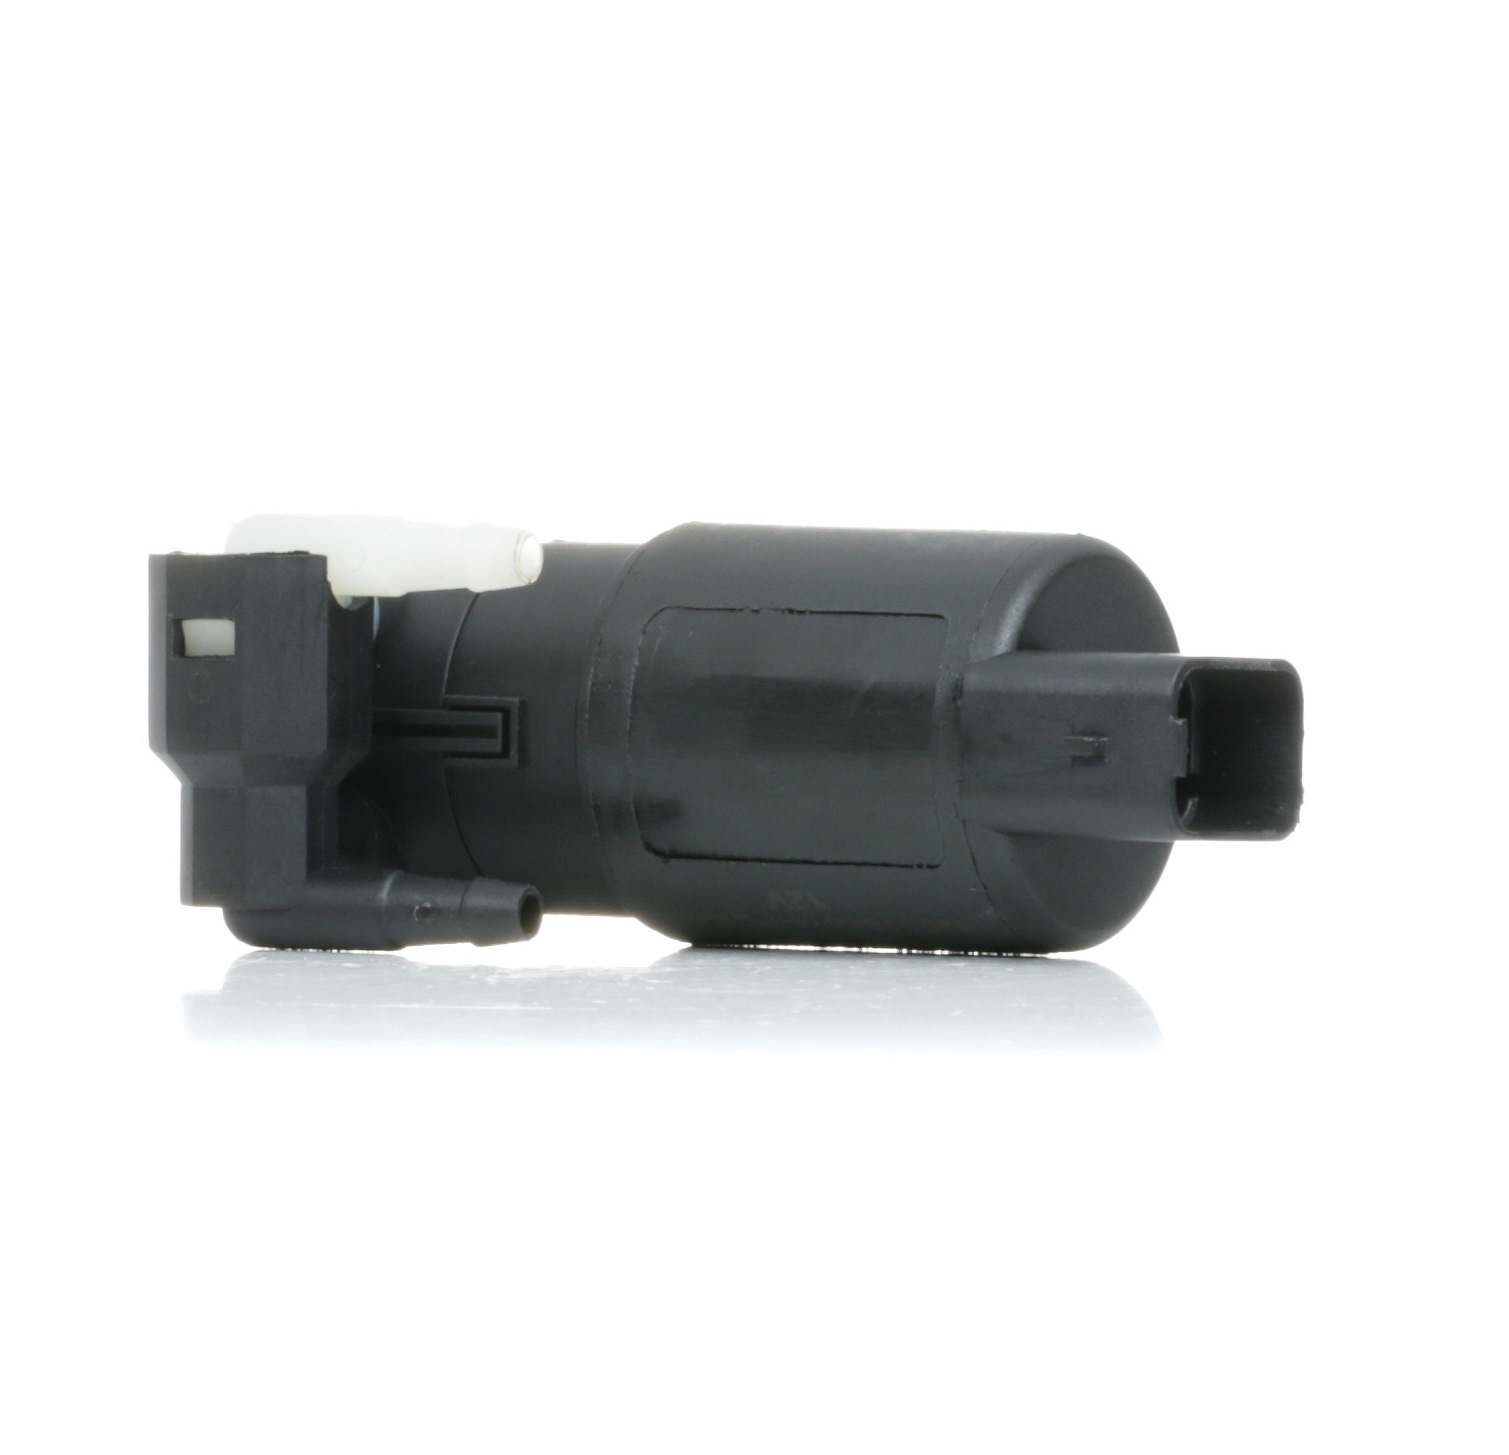 Scheibenwaschpumpe MASTER-SPORT 8200194414-PCS-MS Bewertung